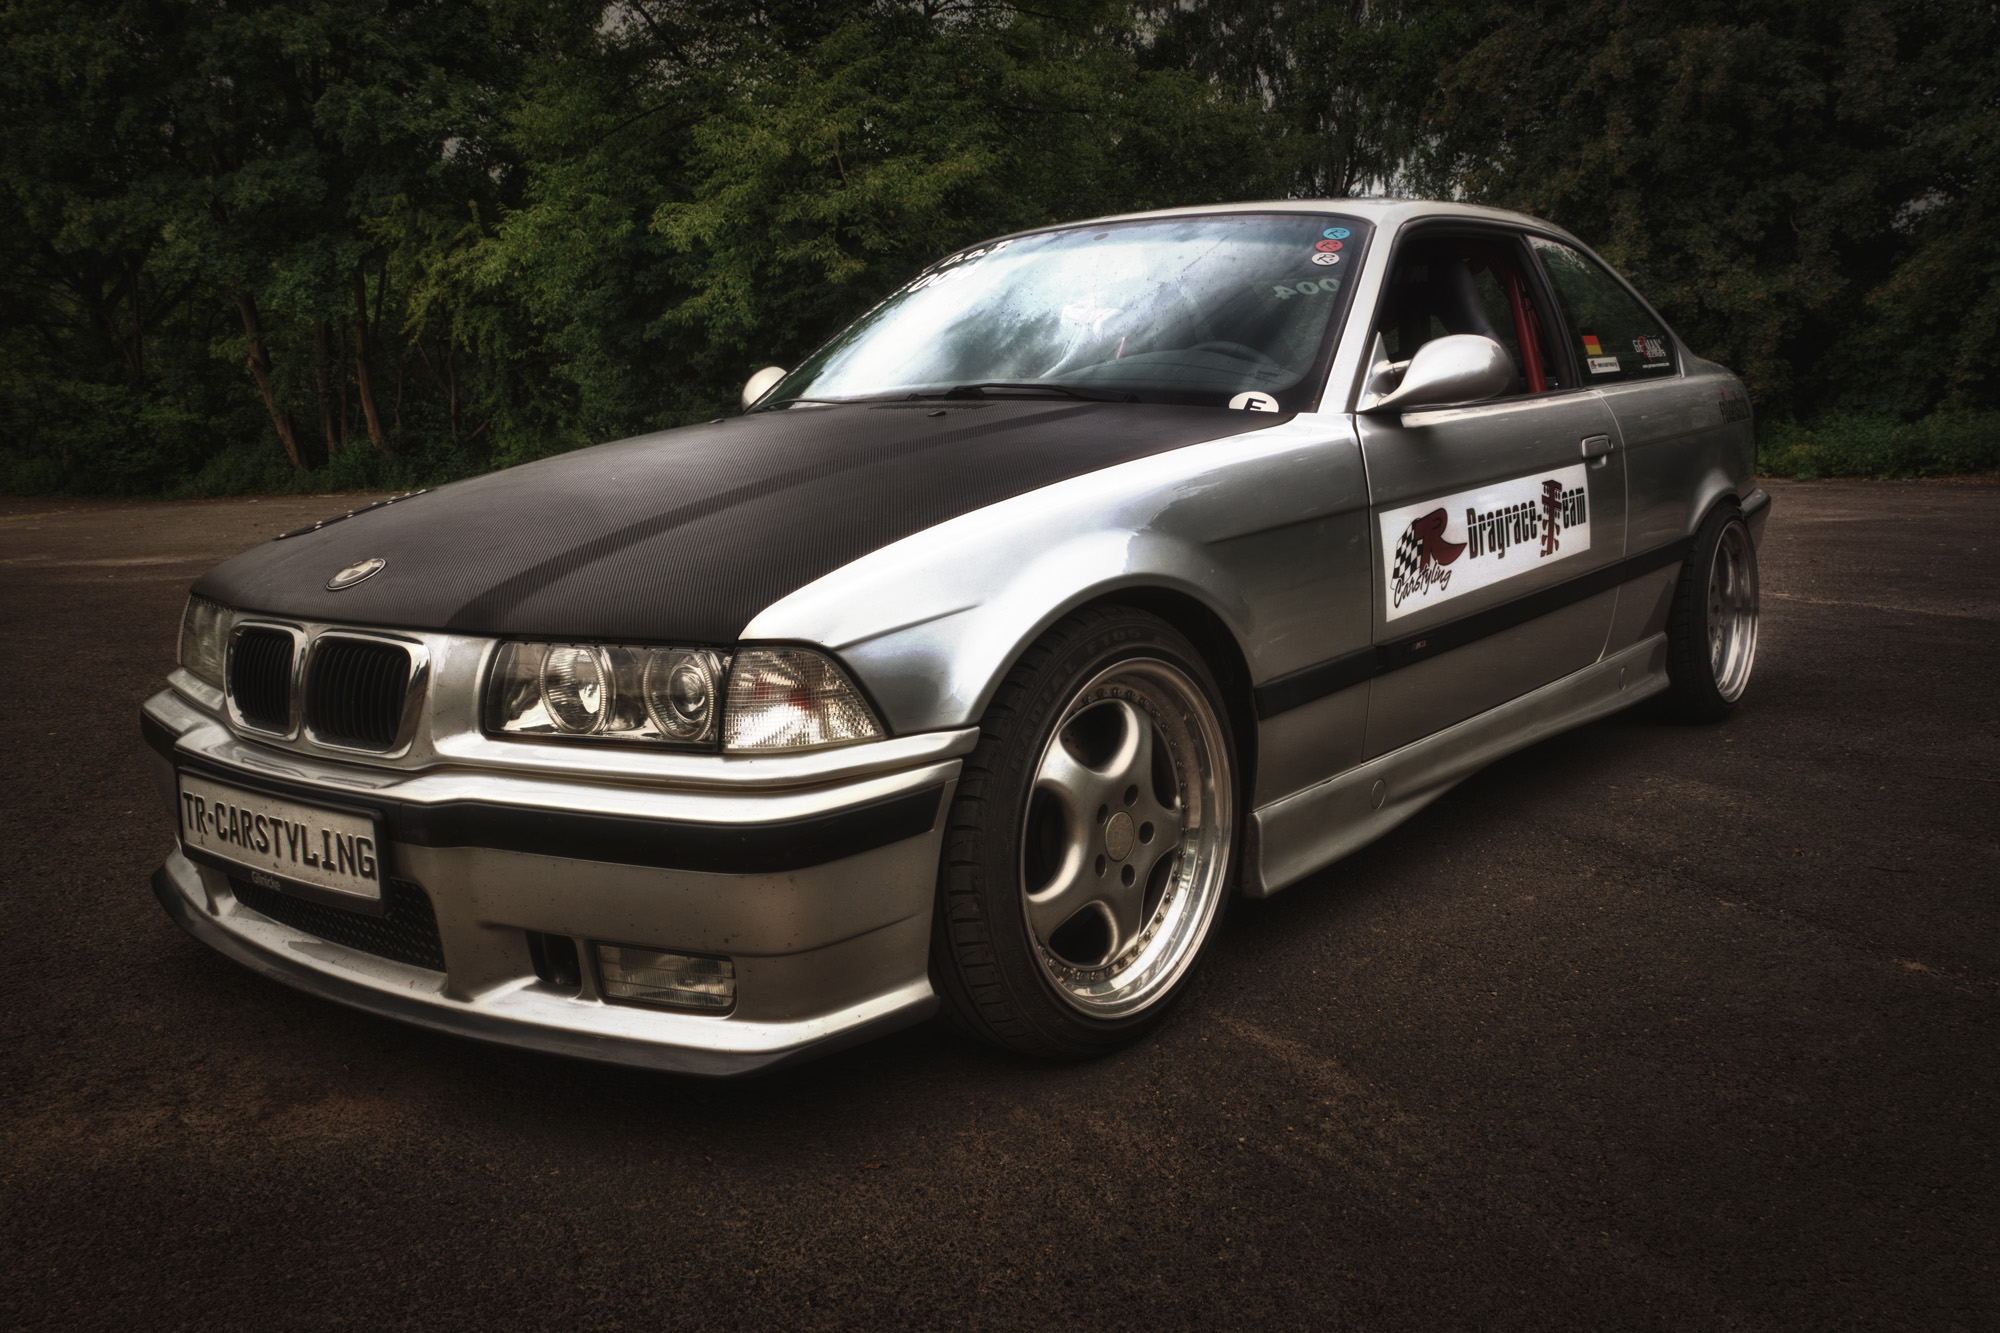 bmw-m3-e36-turbo-tr-carstyling-14